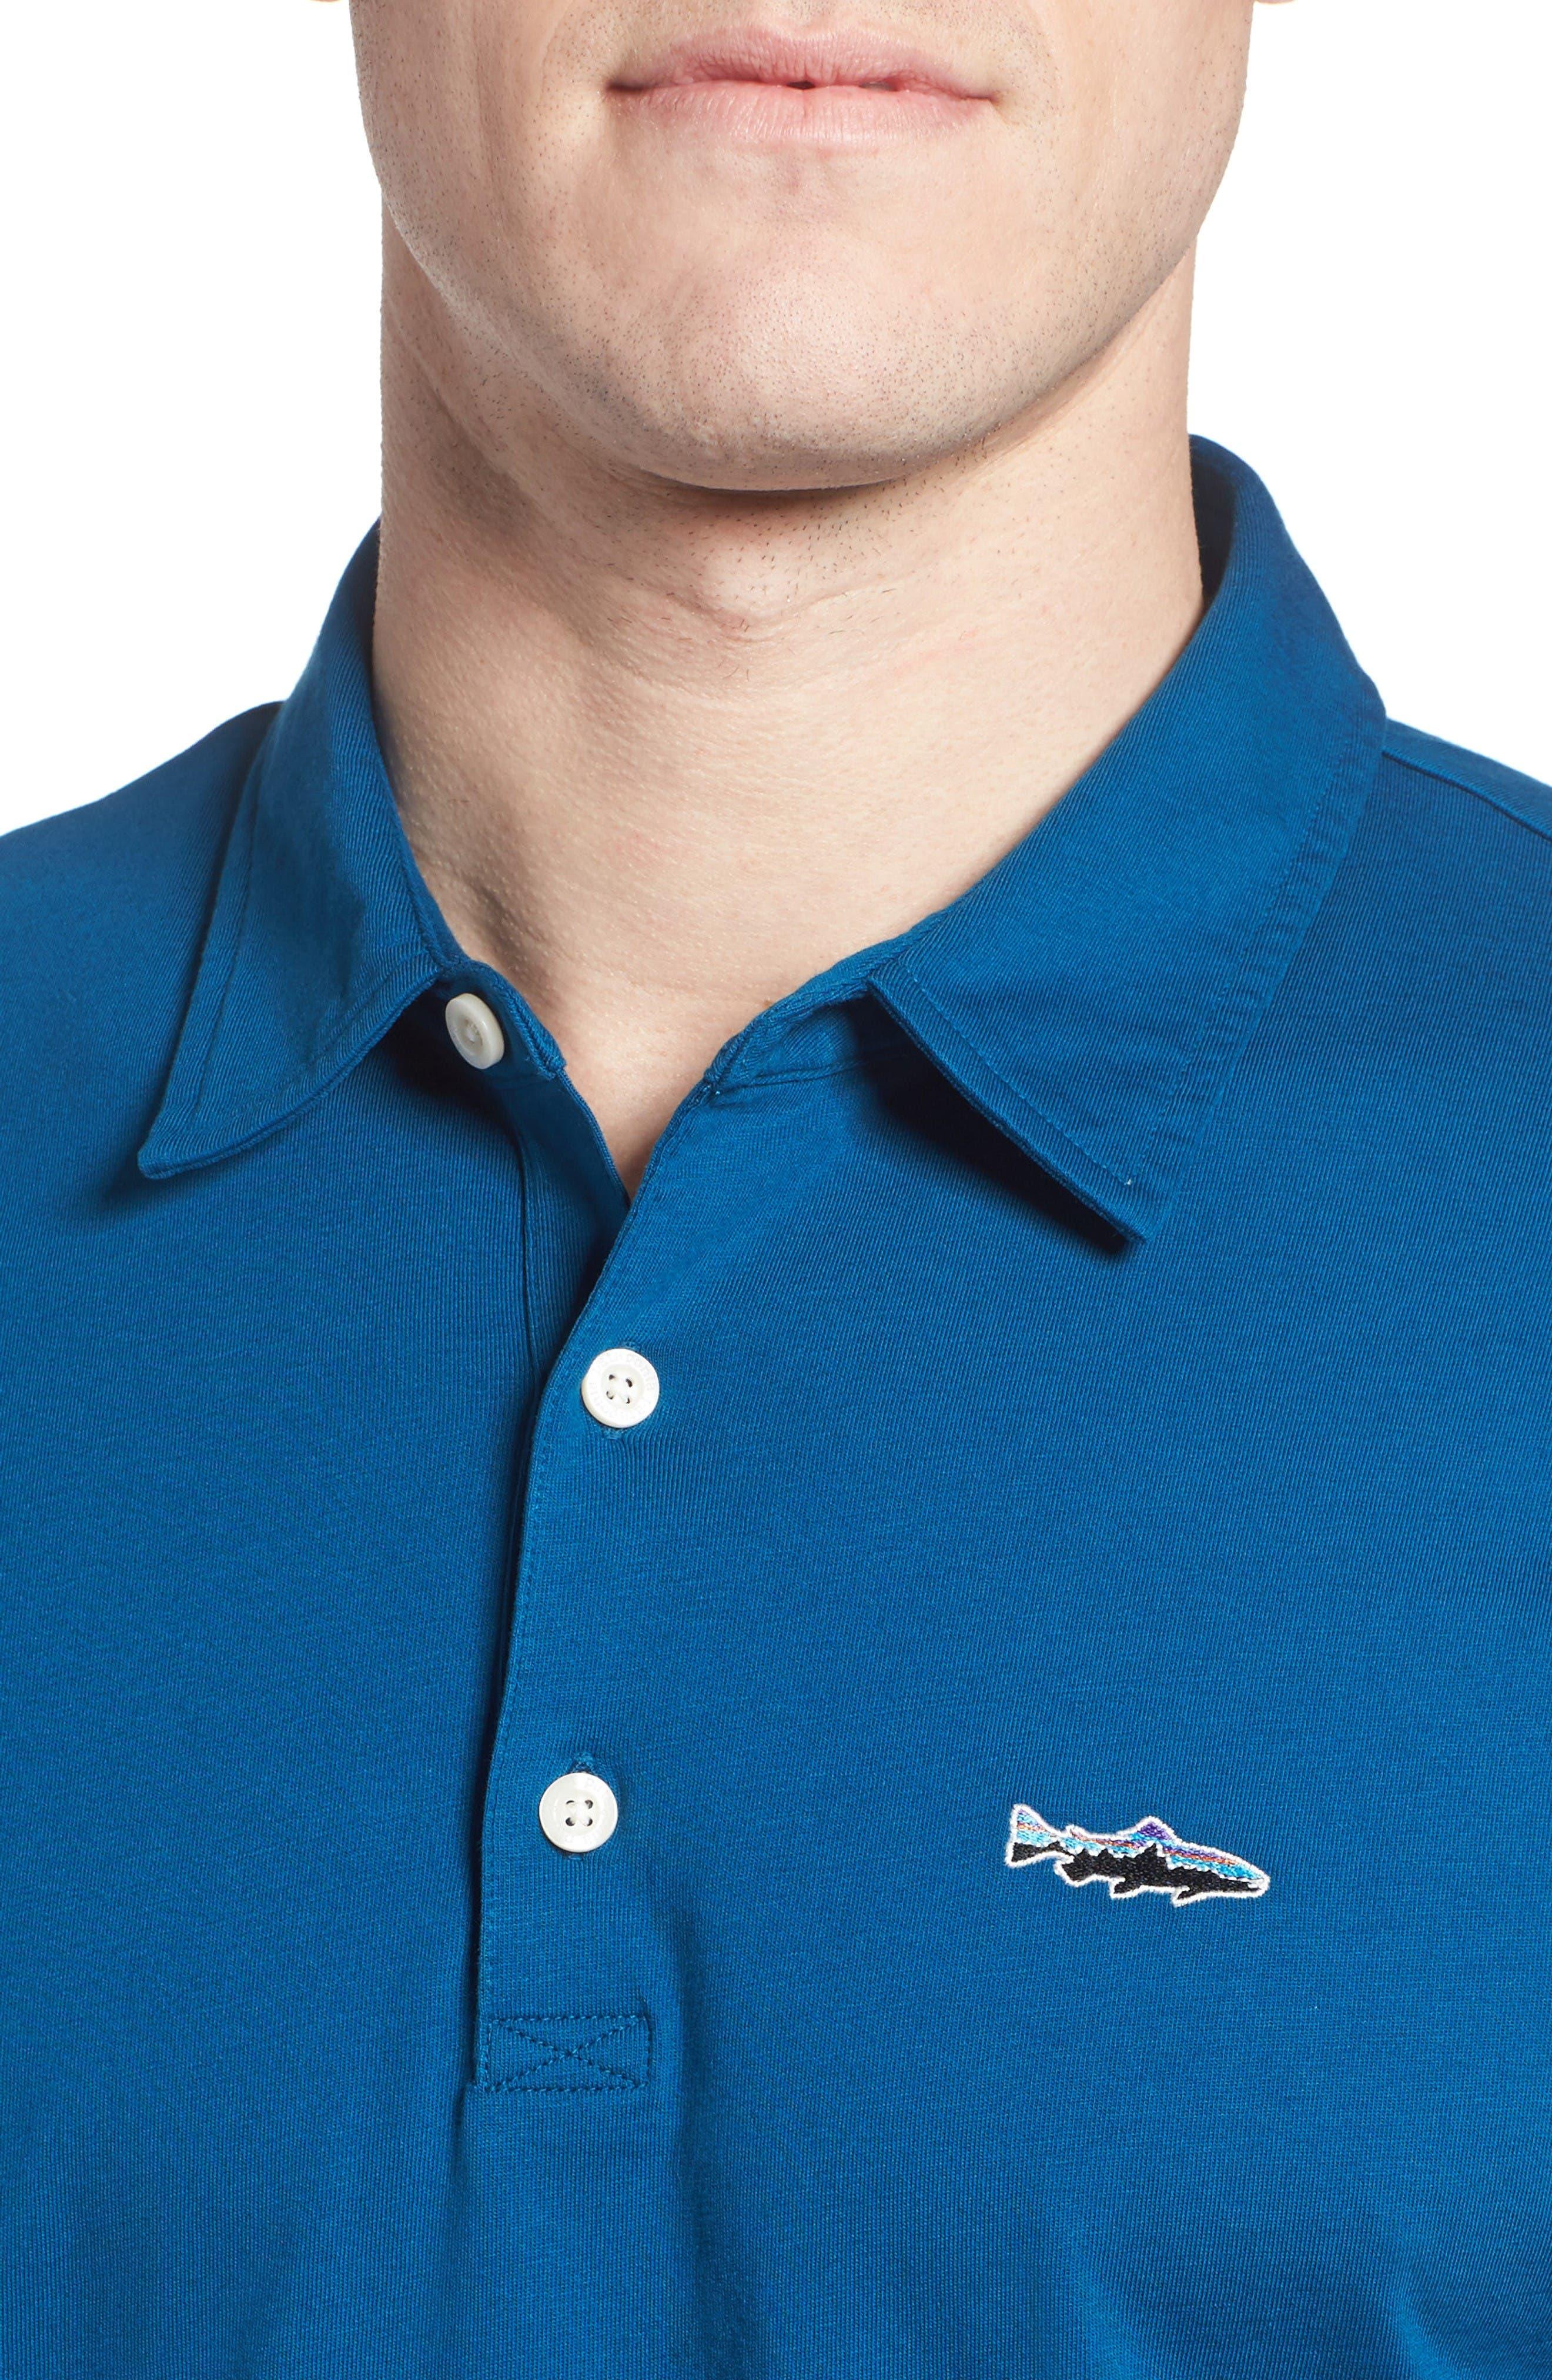 'Trout Fitz Roy' Organic Cotton Polo,                             Alternate thumbnail 4, color,                             Radar Blue